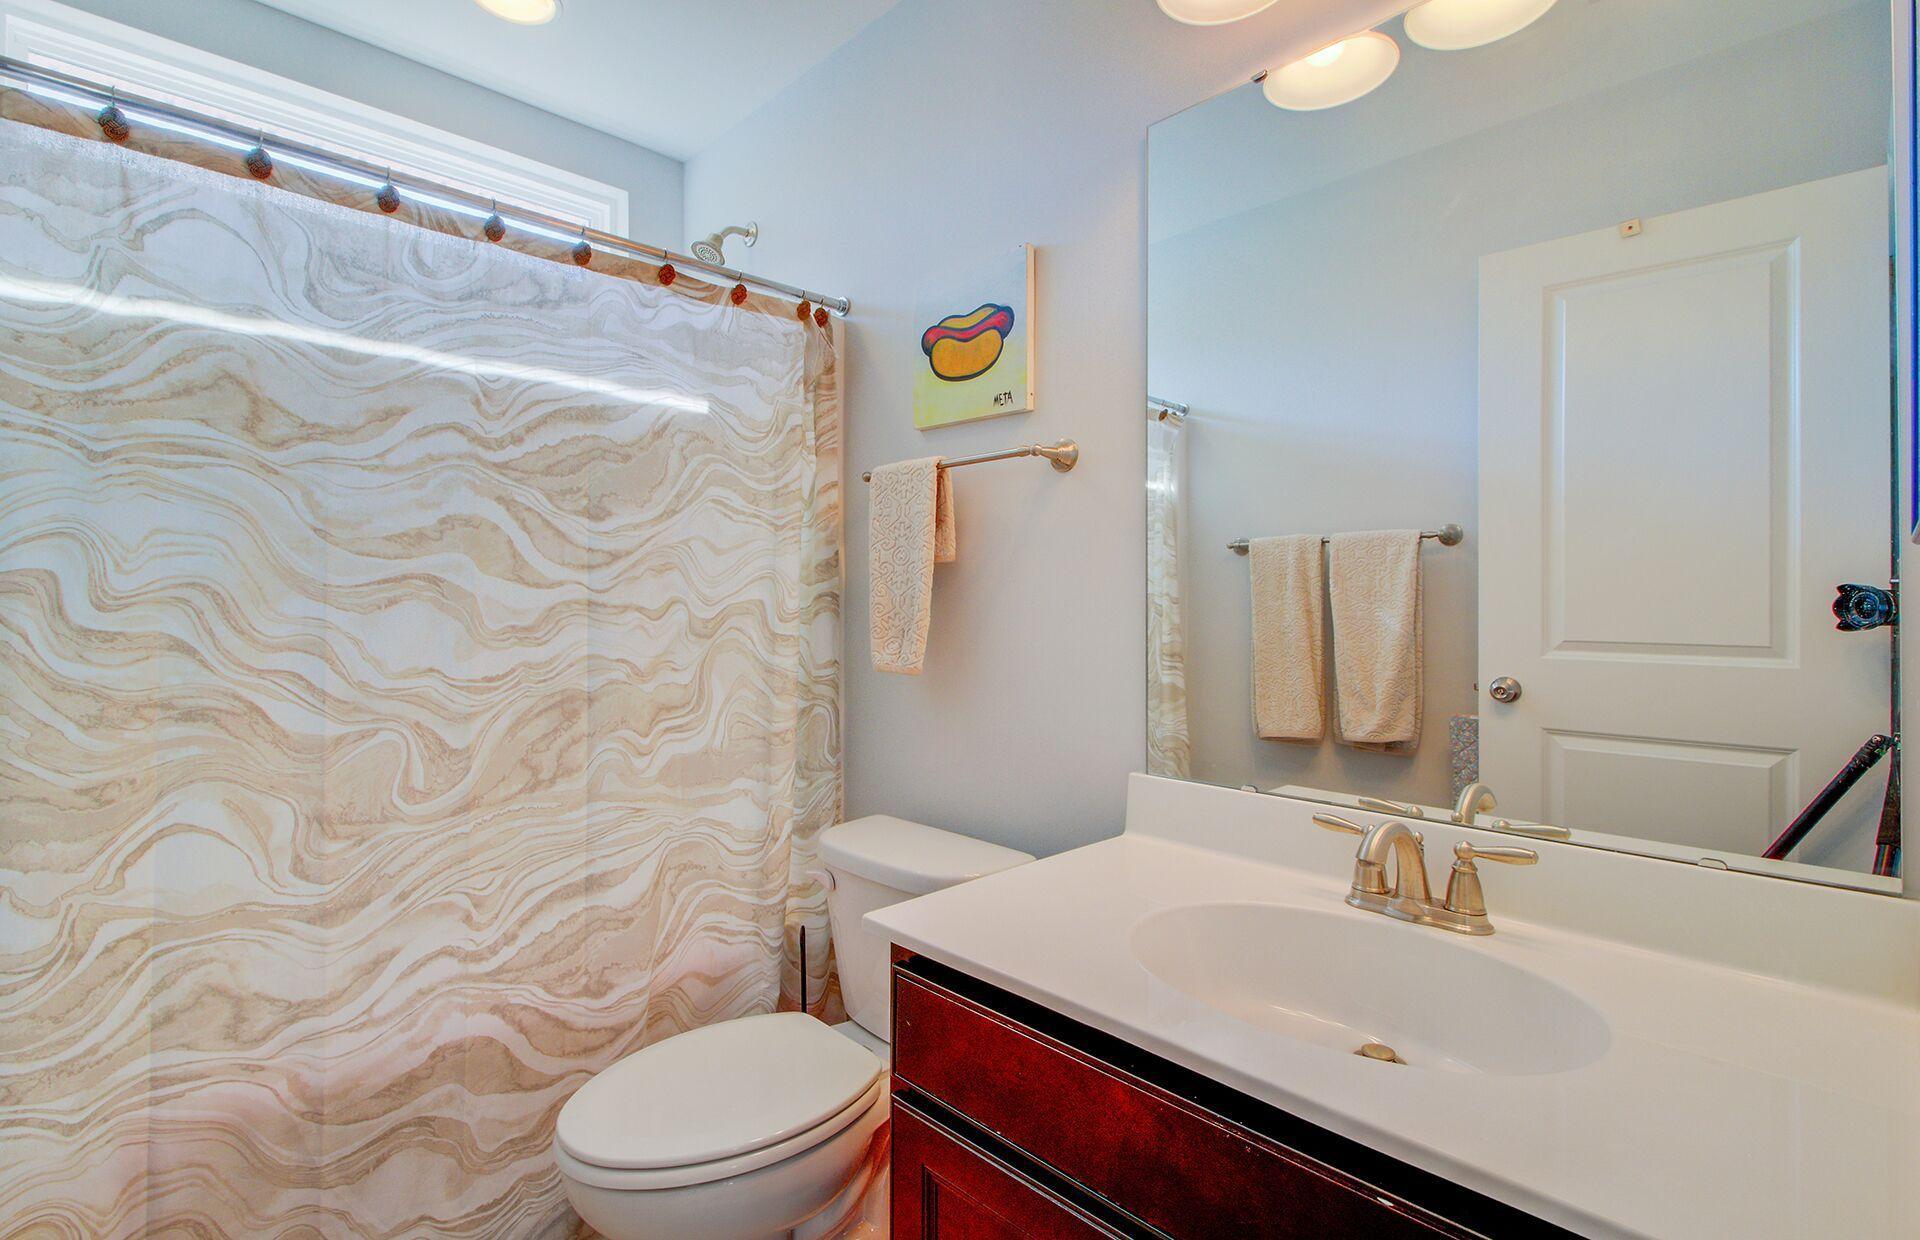 Oak Terrace Preserve Homes For Sale - 4967 Liberty Park, North Charleston, SC - 15